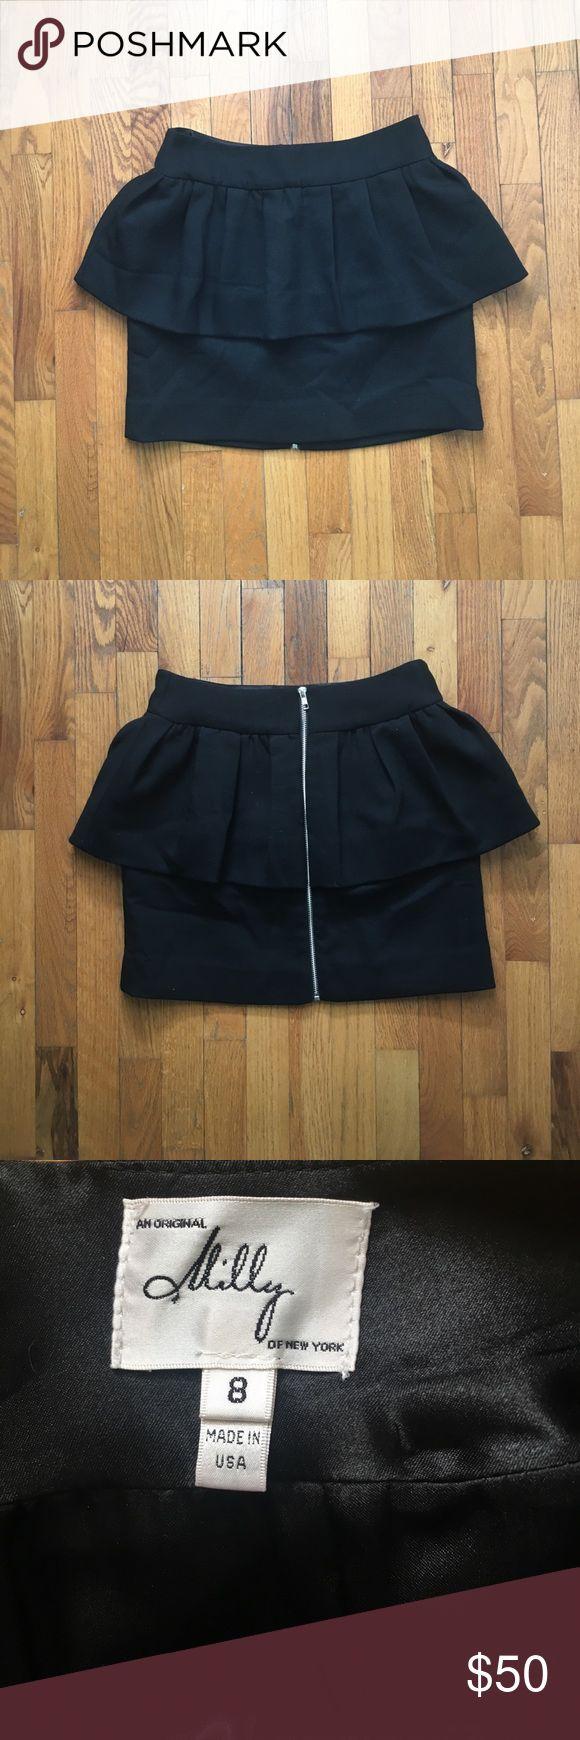 Black Peplum Milly Skirt **NEVER WORN** - Black peplum skirt - Size 8 - Made in USA Milly Skirts Mini